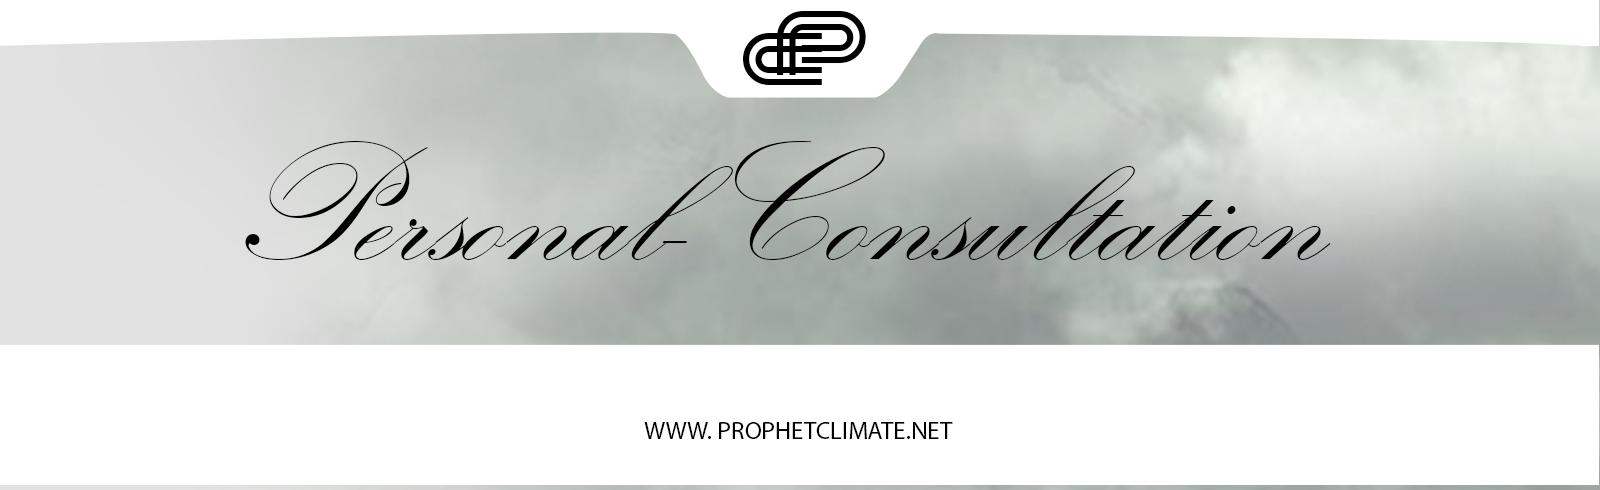 Personal-Consultation-PCN006